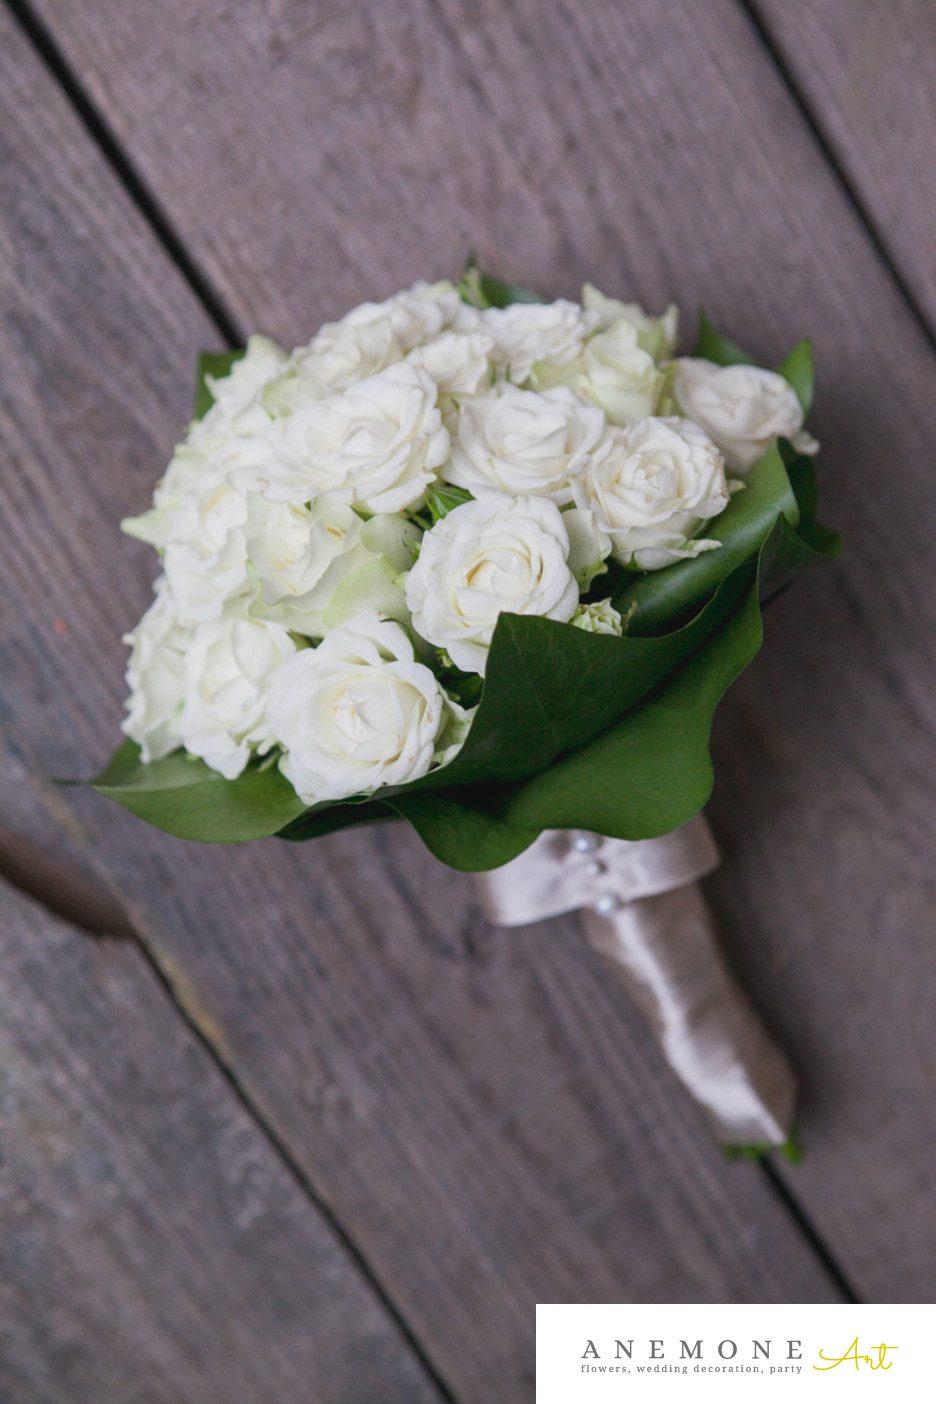 Poza, foto cu Flori de nunta alb, buchet mireasa, legat, trandafiri in Arad, Timisoara, Oradea (wedding flowers, bouquets) nunta Arad, Timisoara, Oradea